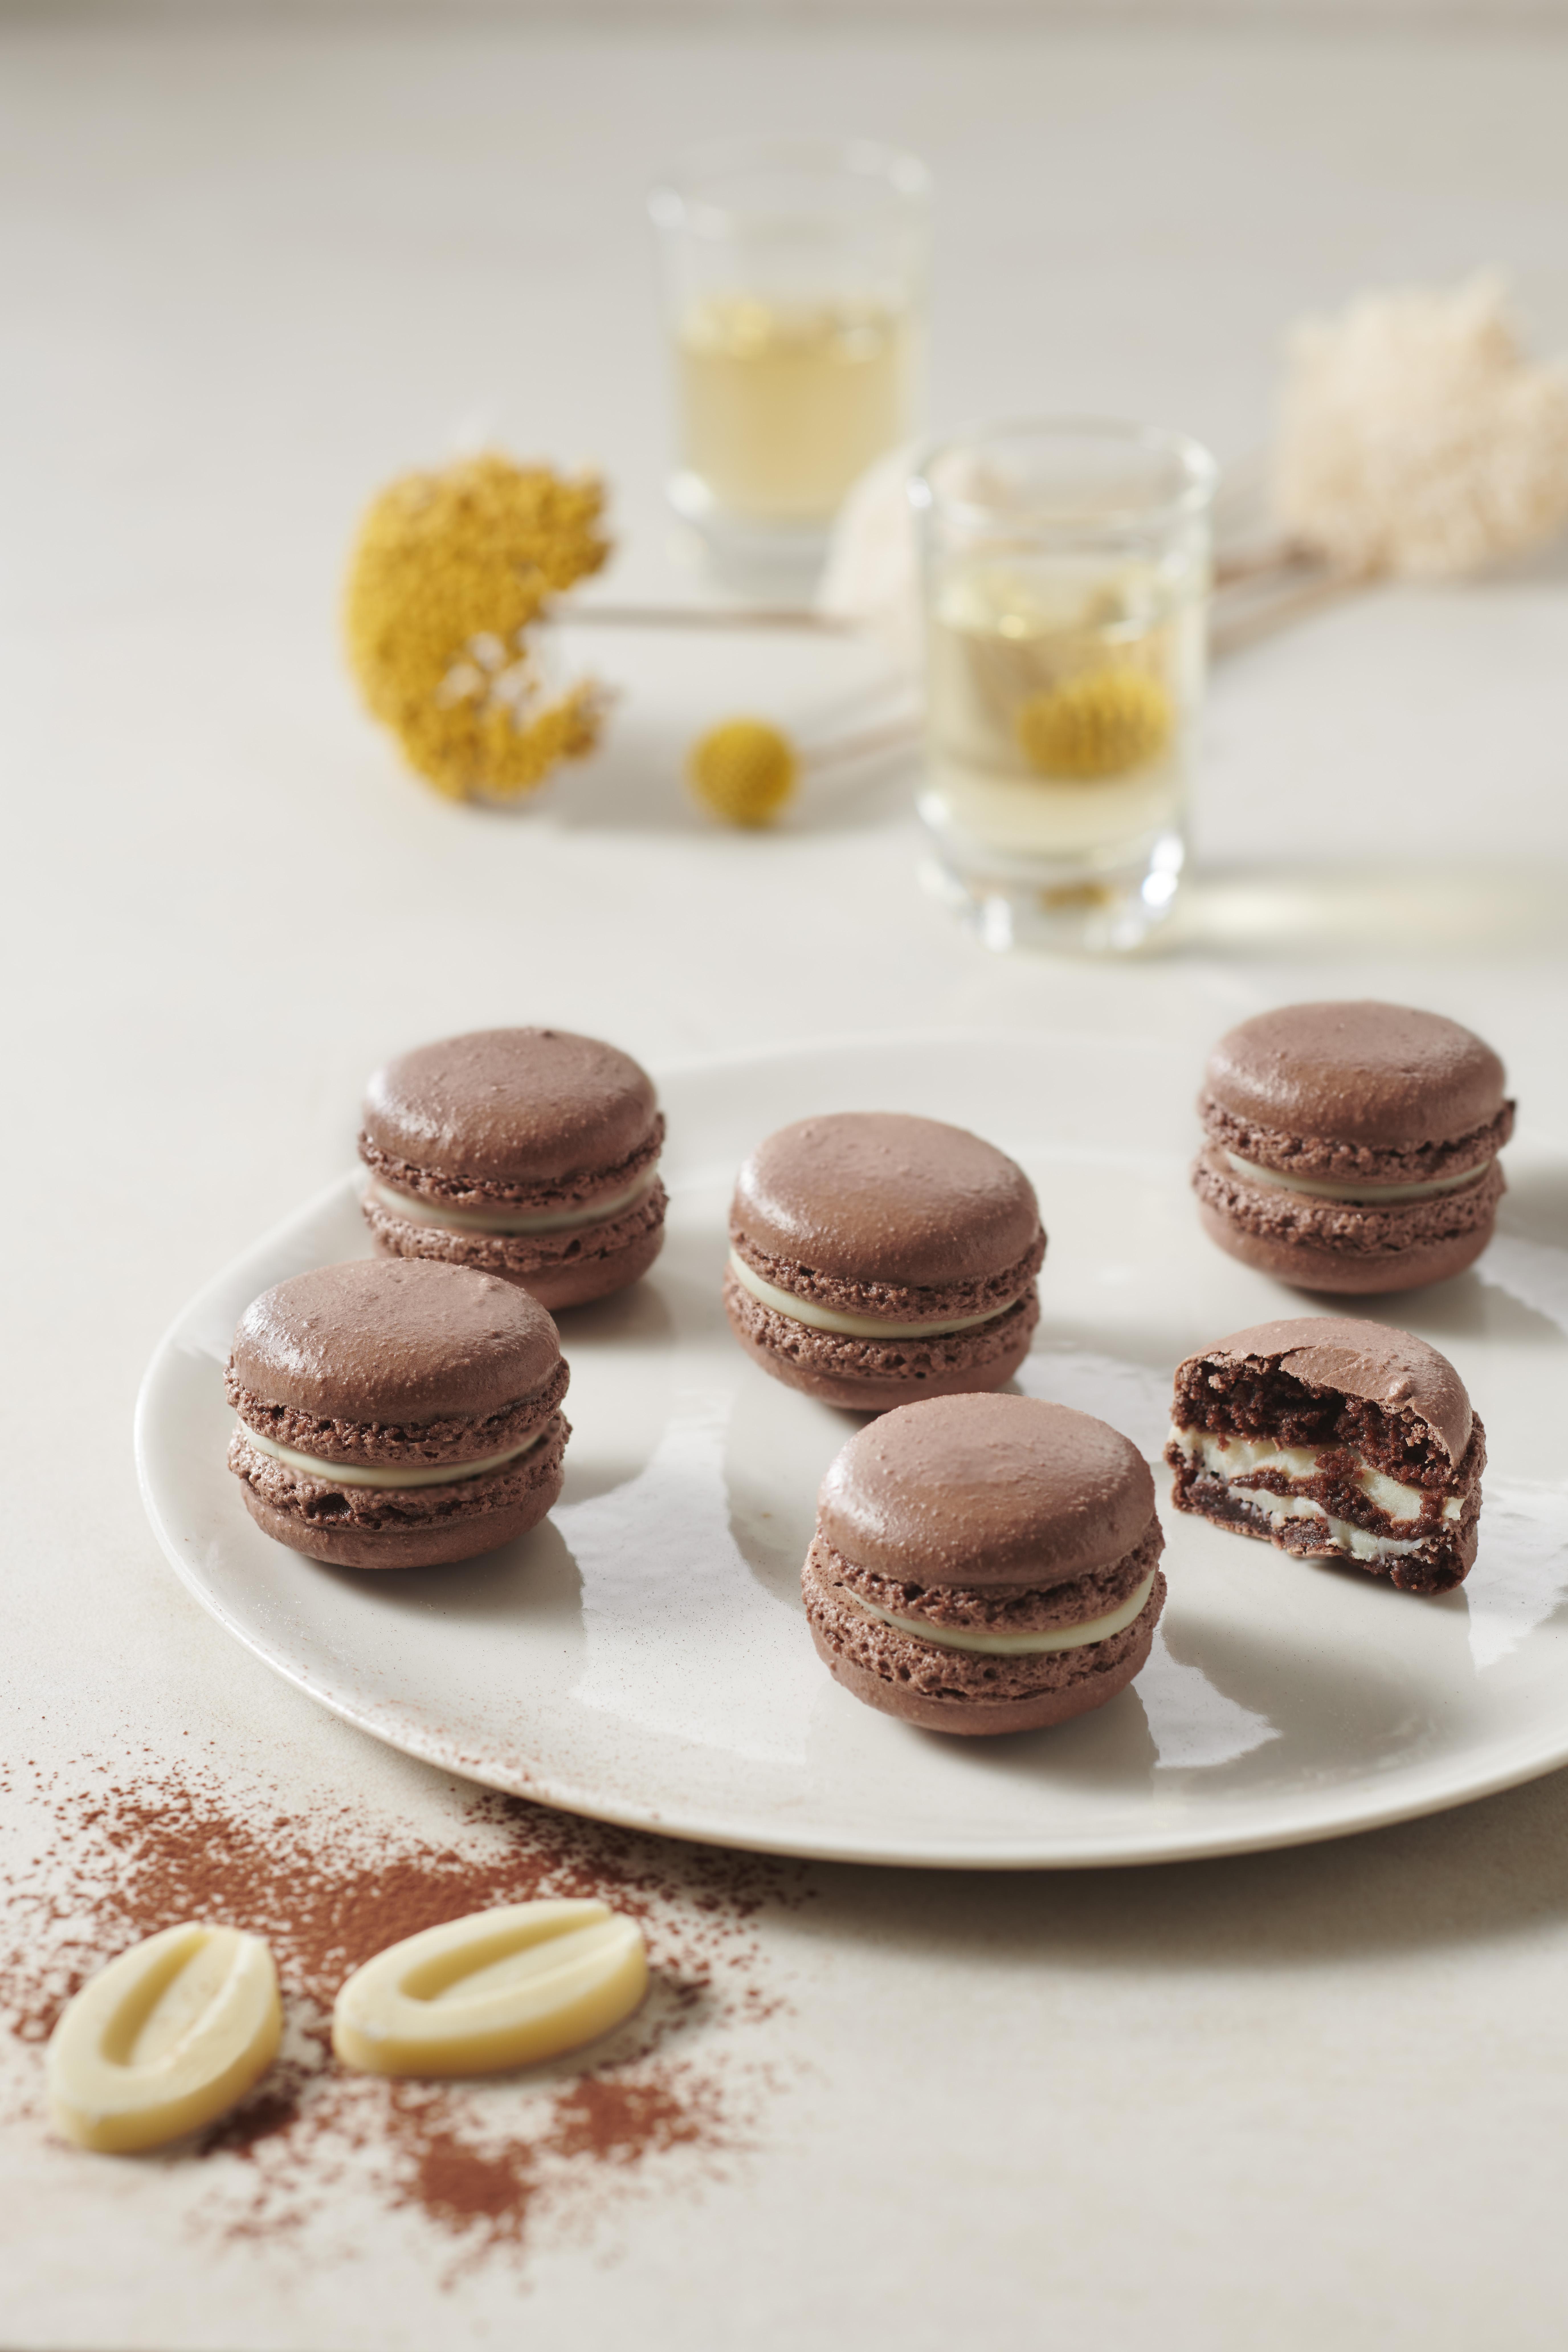 Chocolate Yuzu Macarons